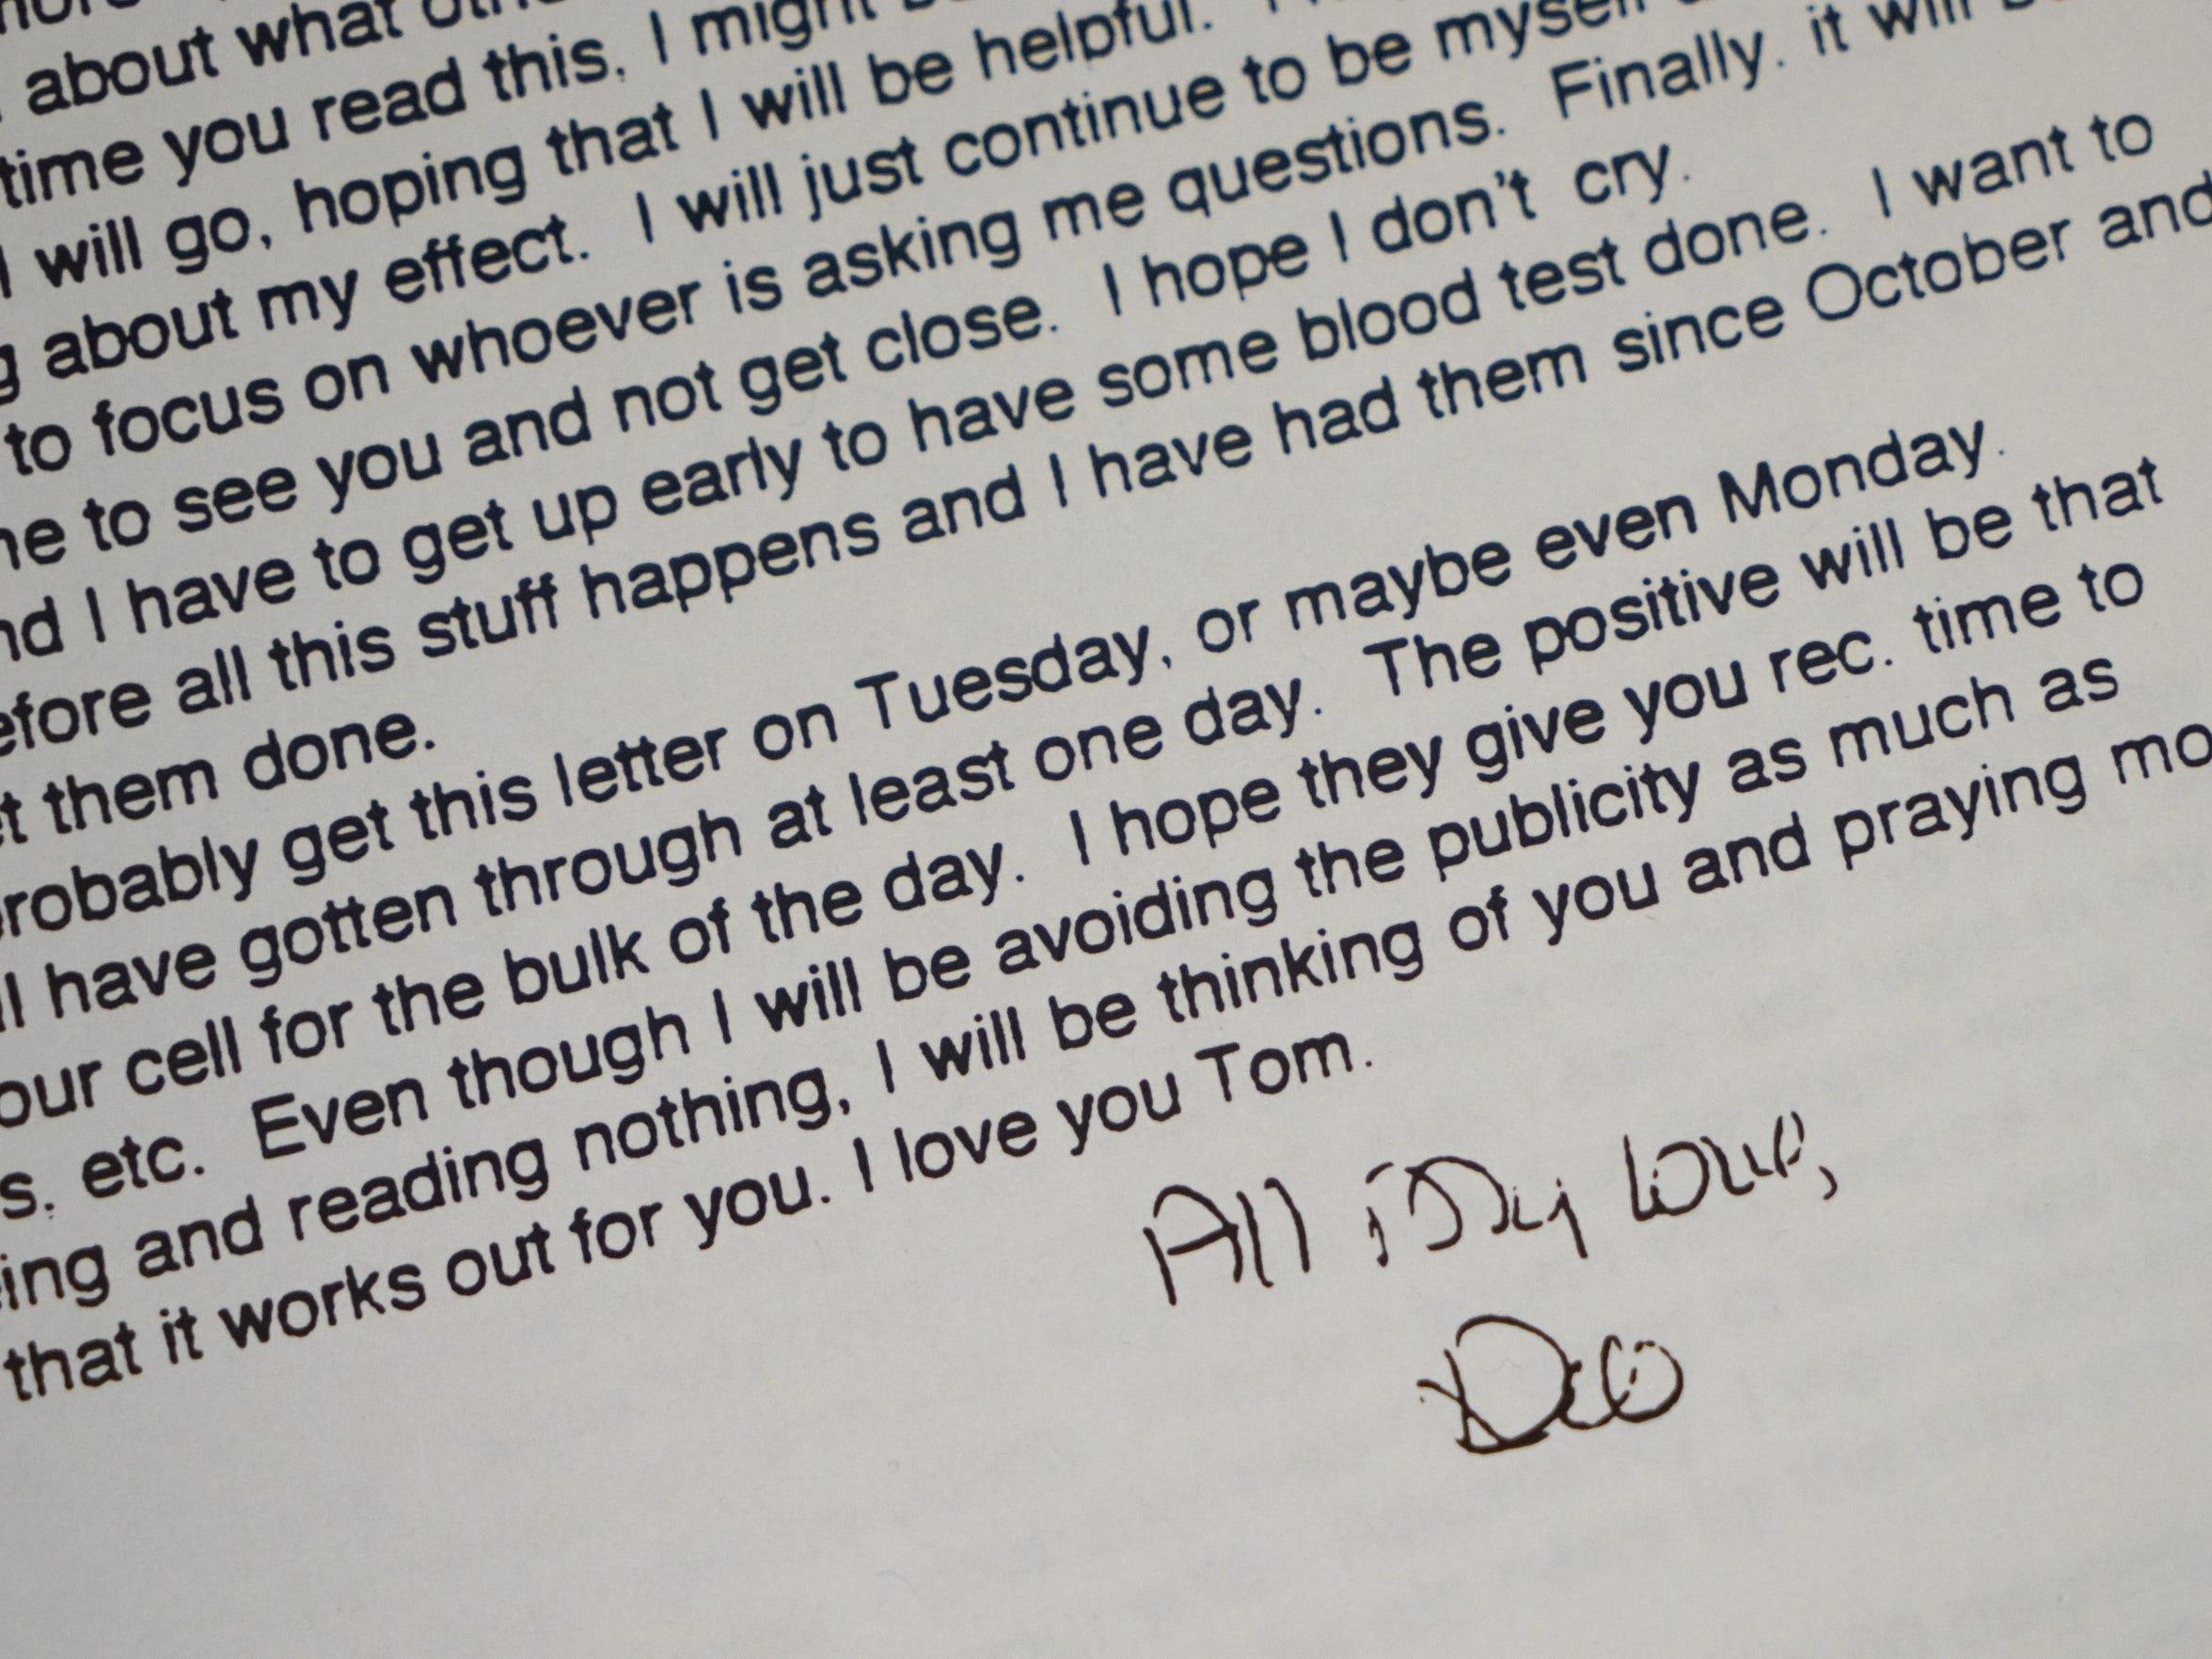 Letters written by Tom Capano's mistress Deborah MacIntyre